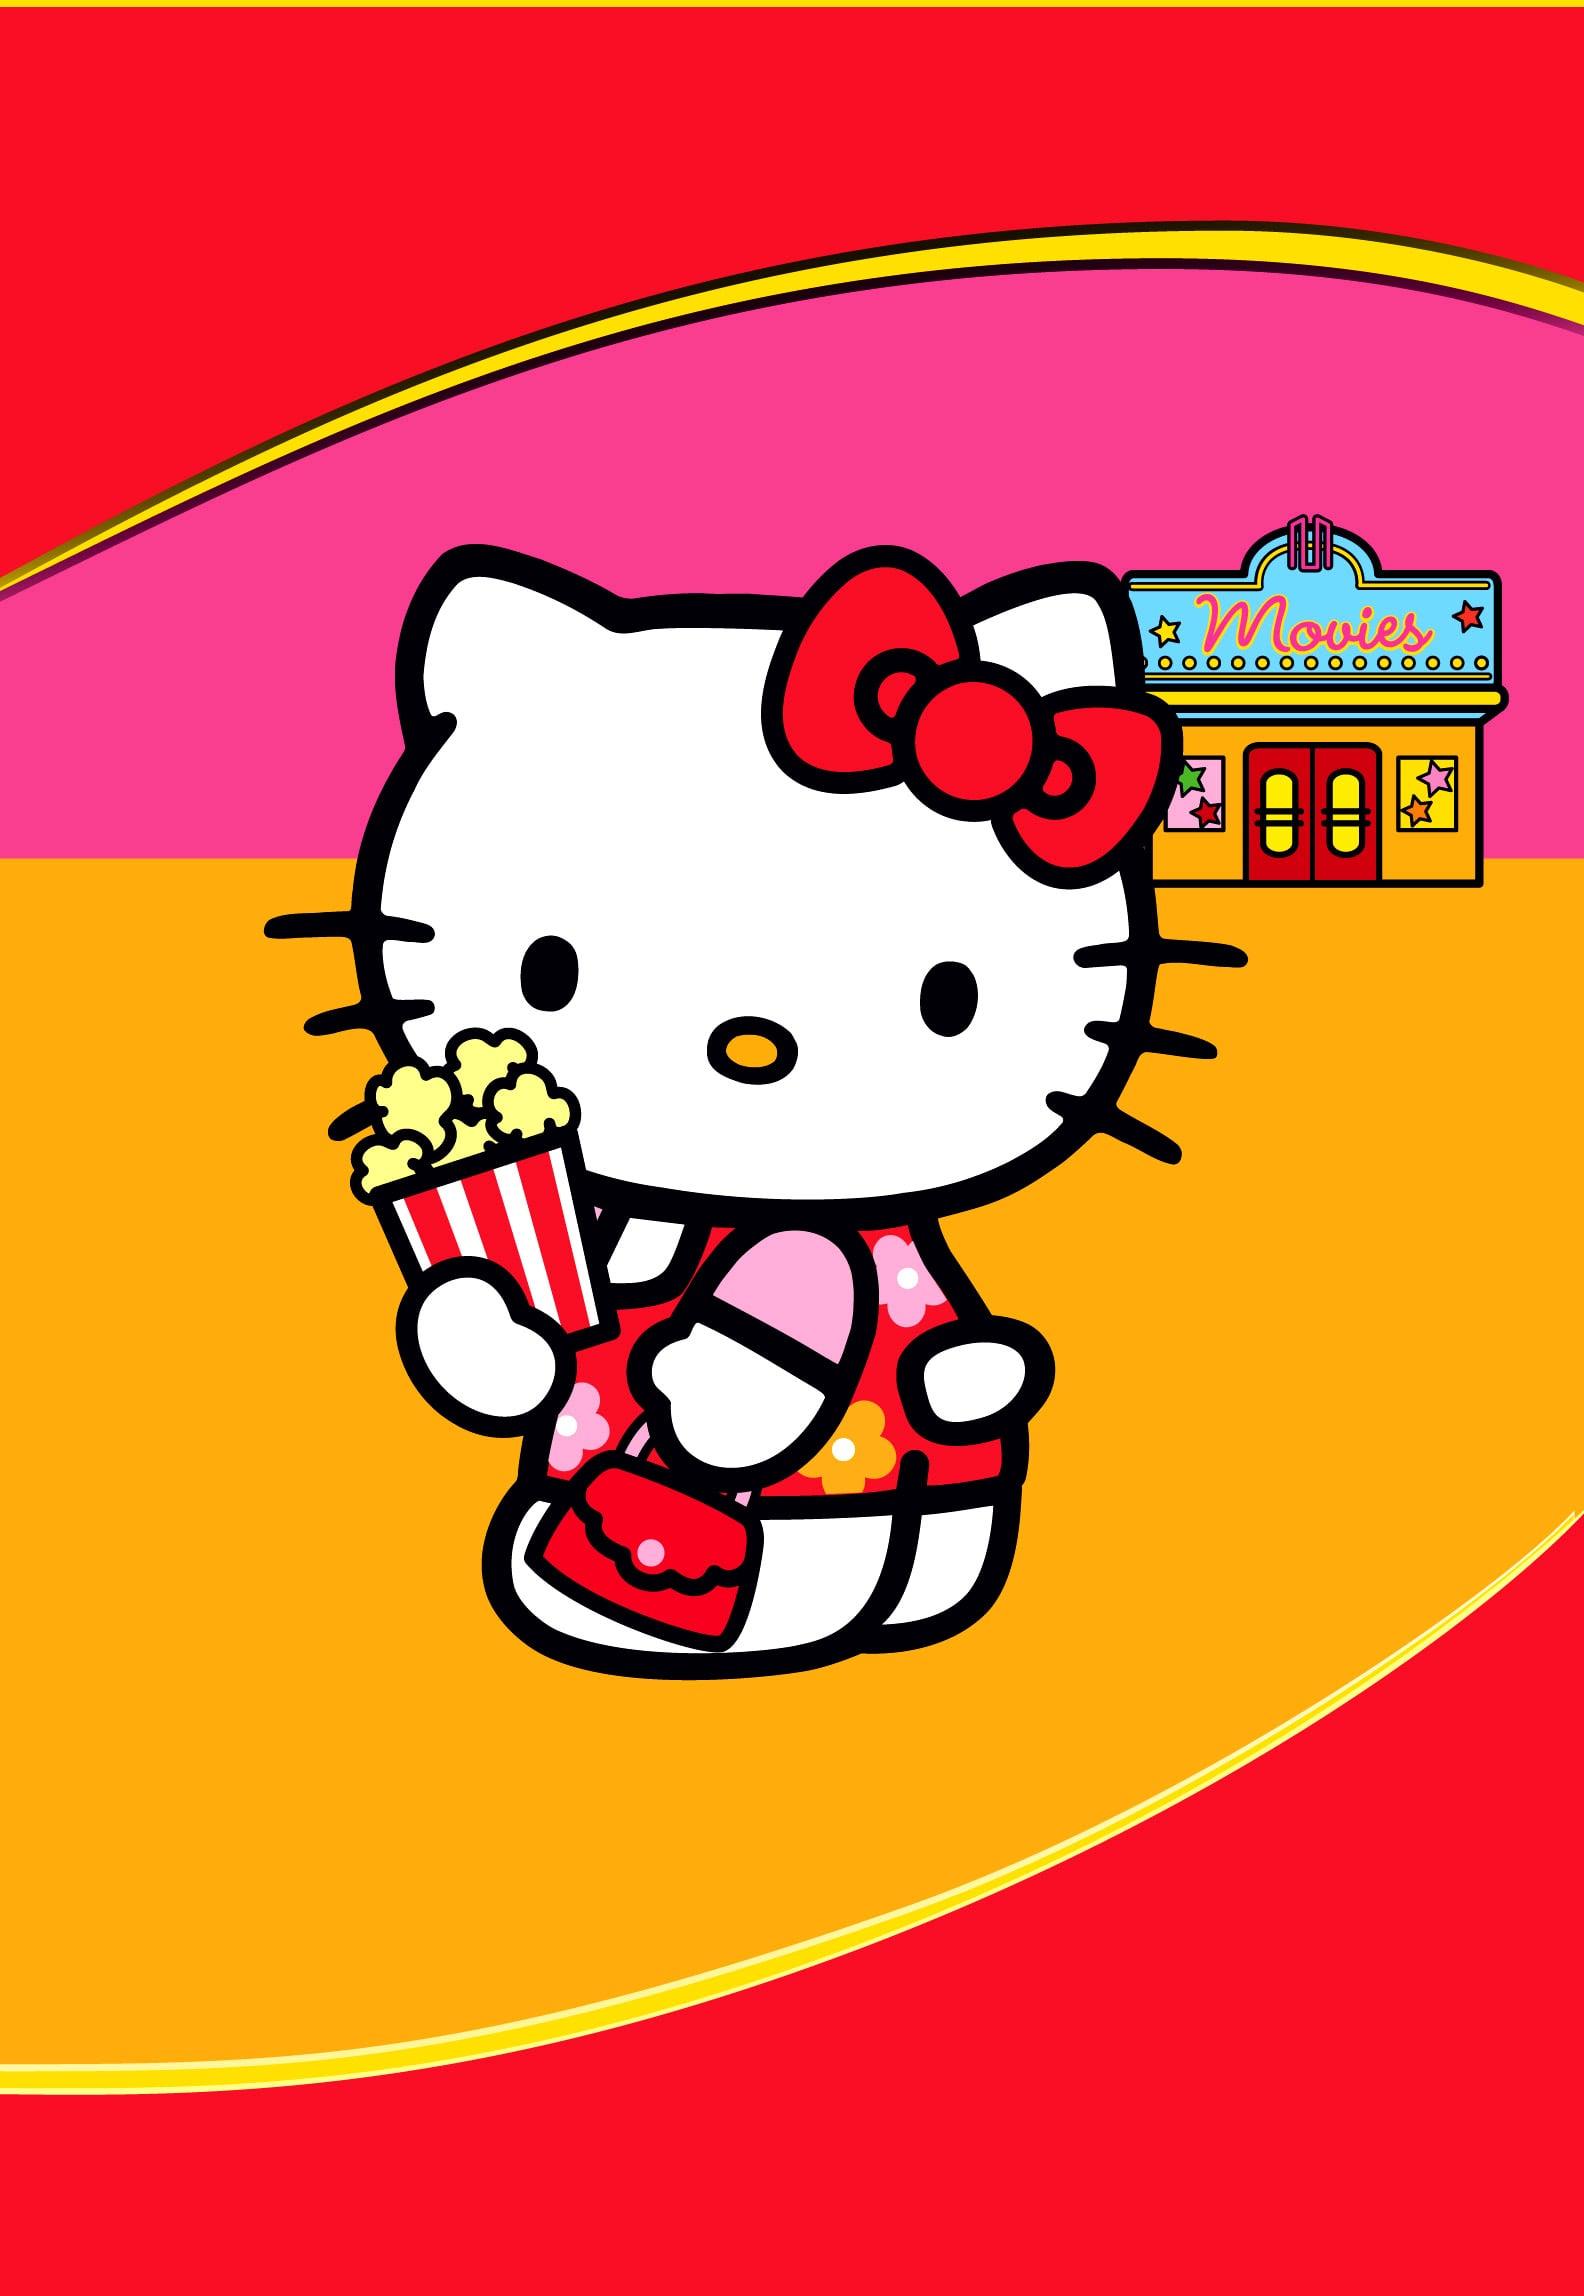 425dc93ac Hello Kitty Movie Details 2019 | POPSUGAR Family